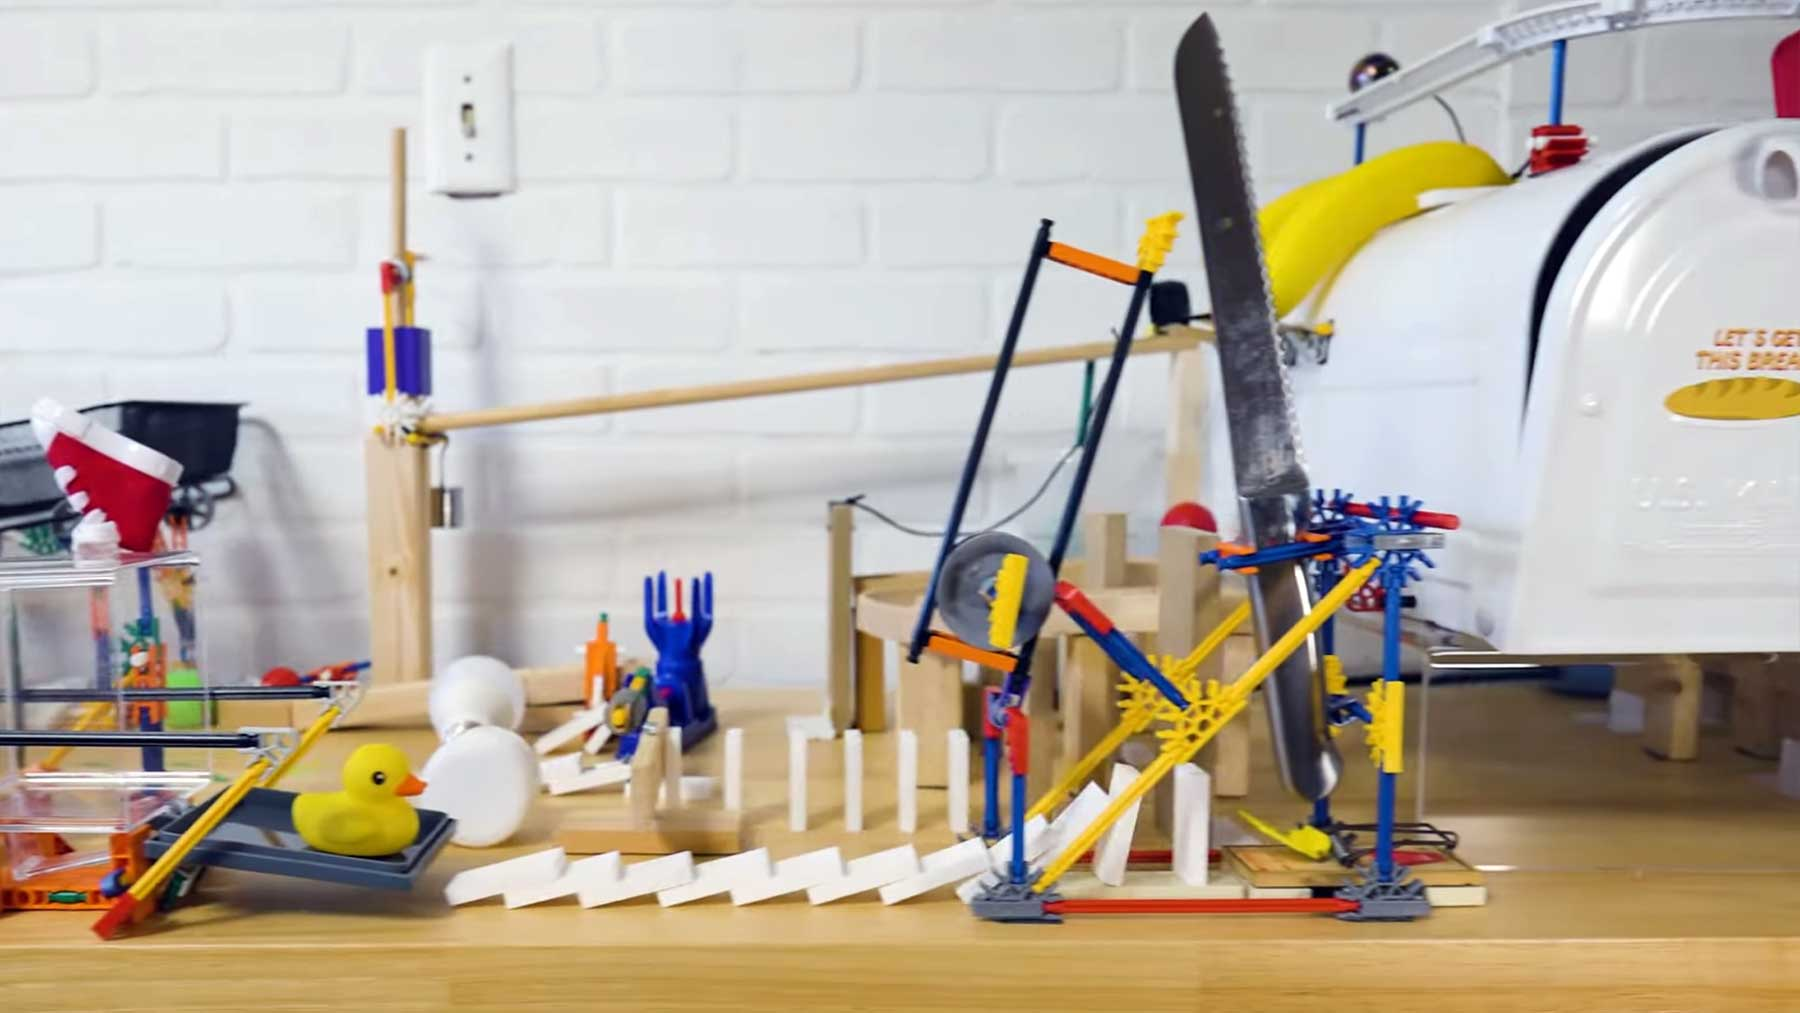 Rube Goldberg Brotschneide-Maschine